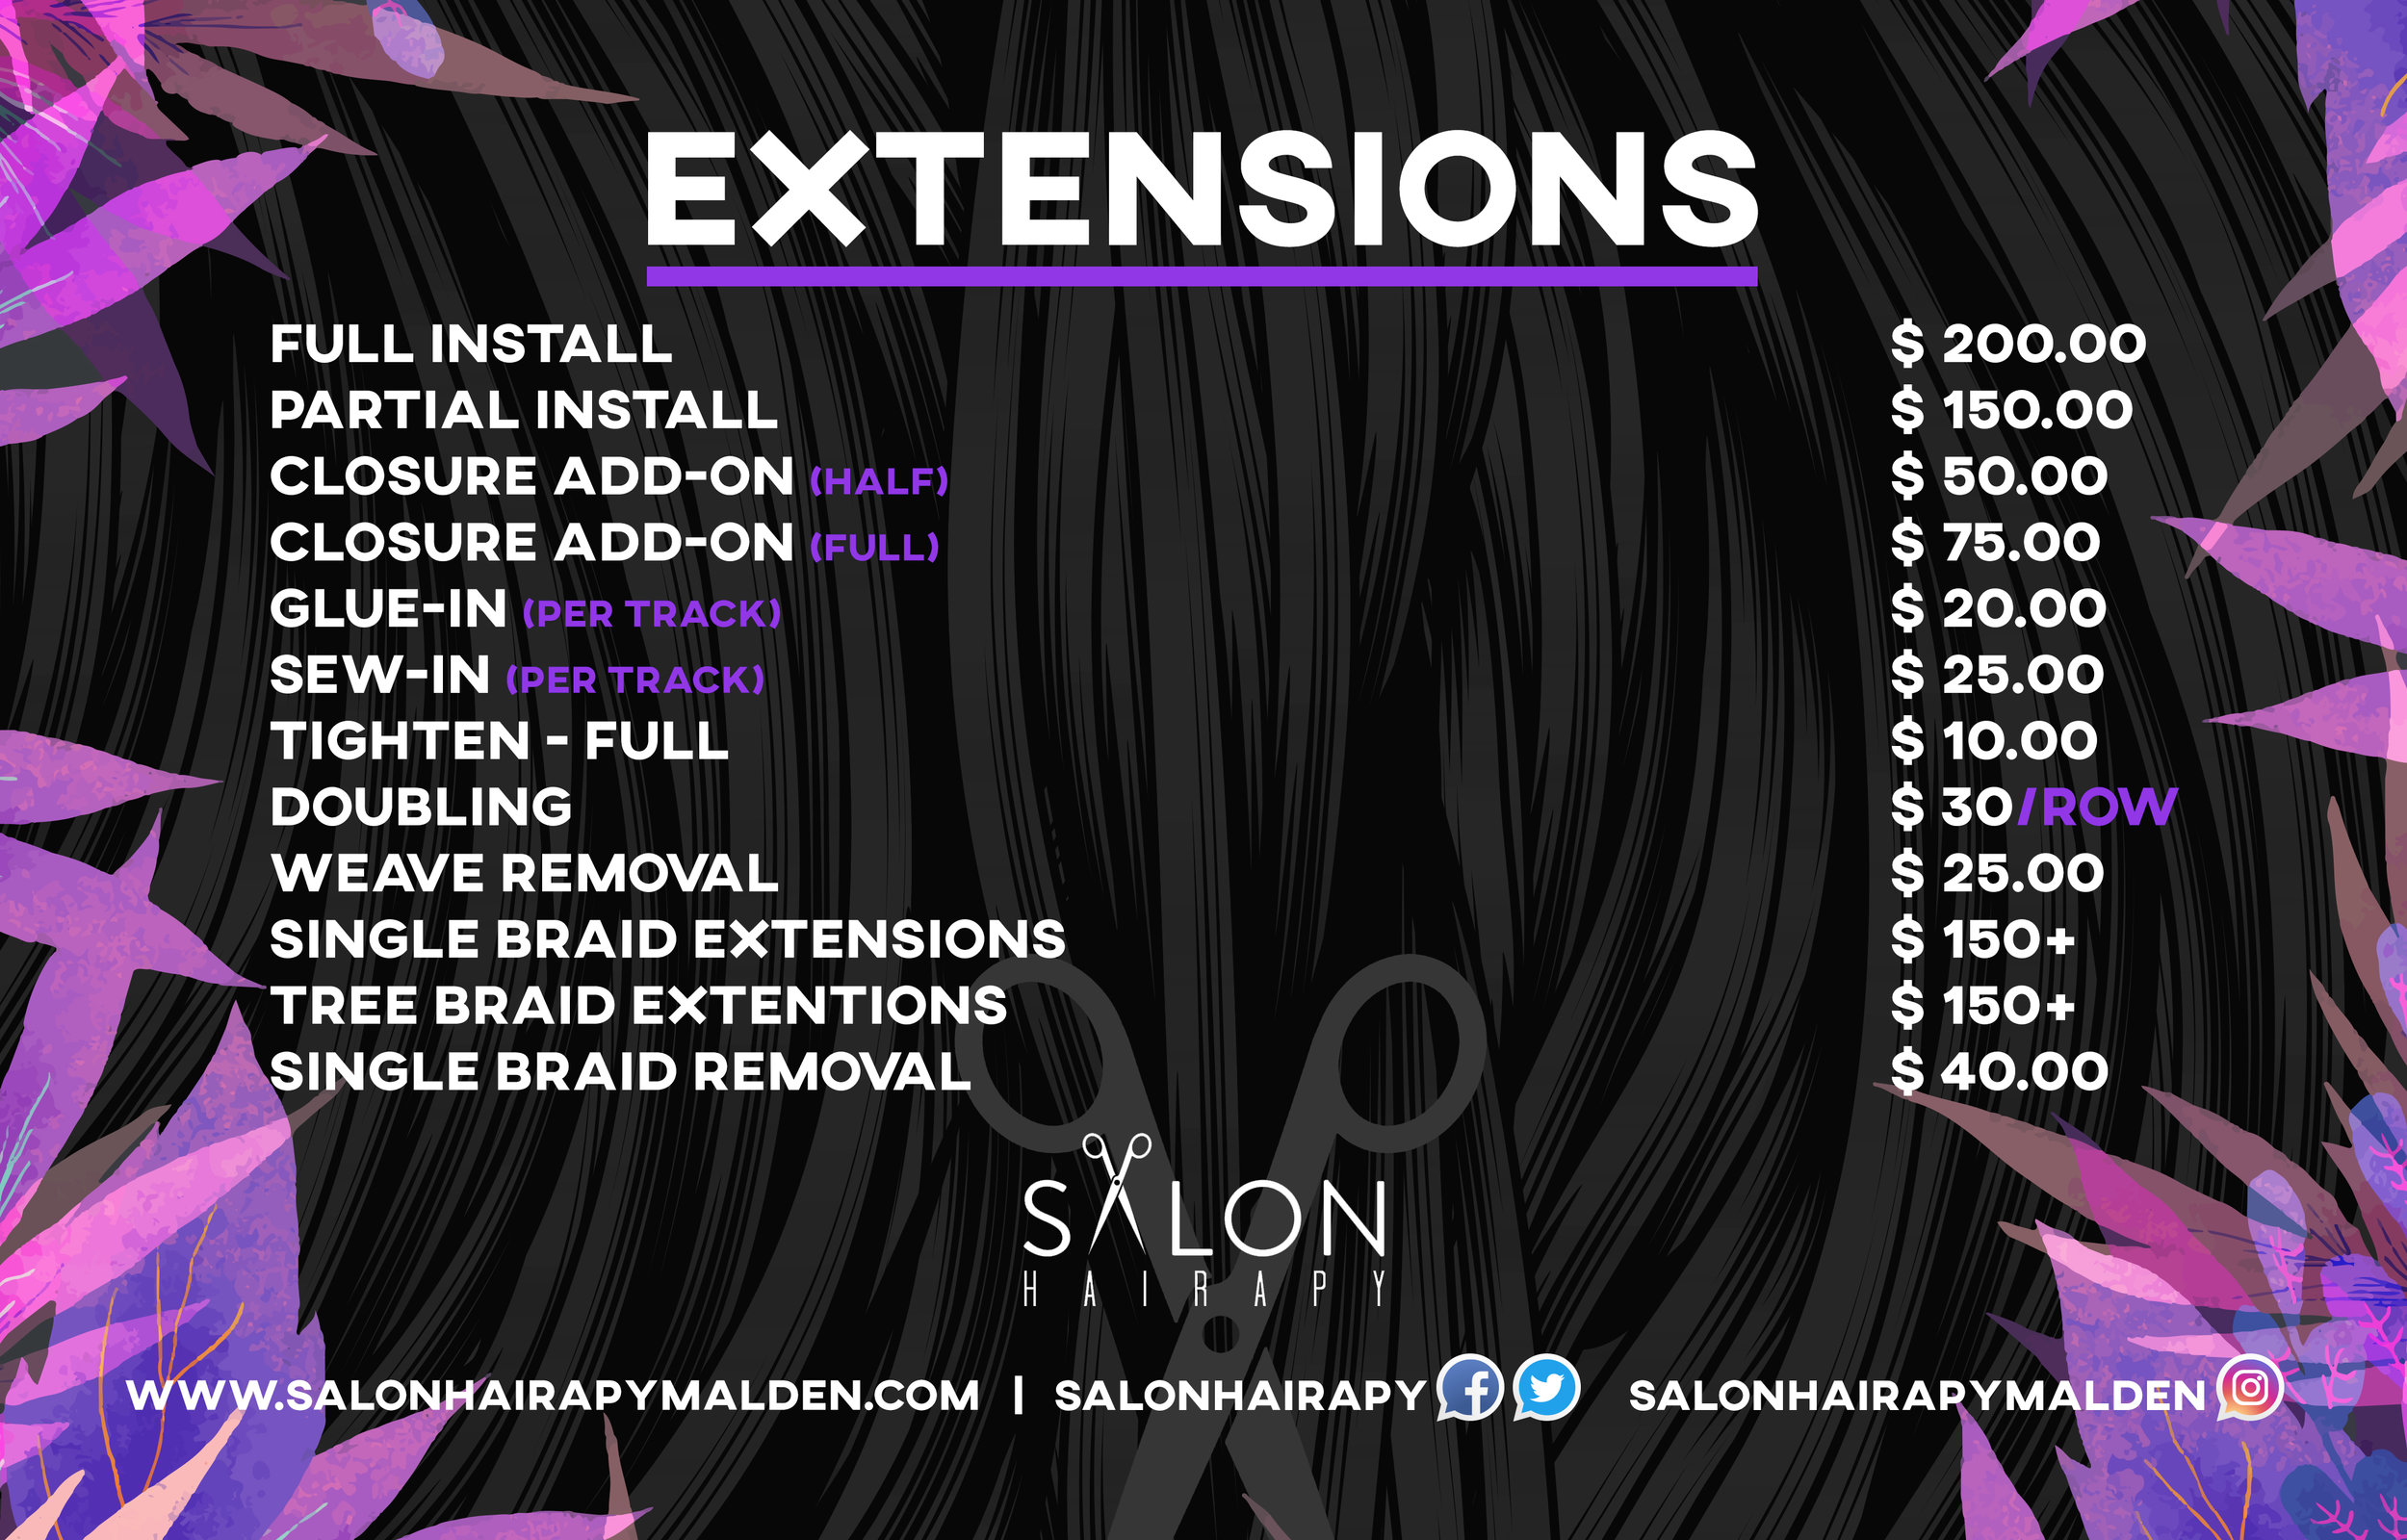 6-Extensions-1.jpg